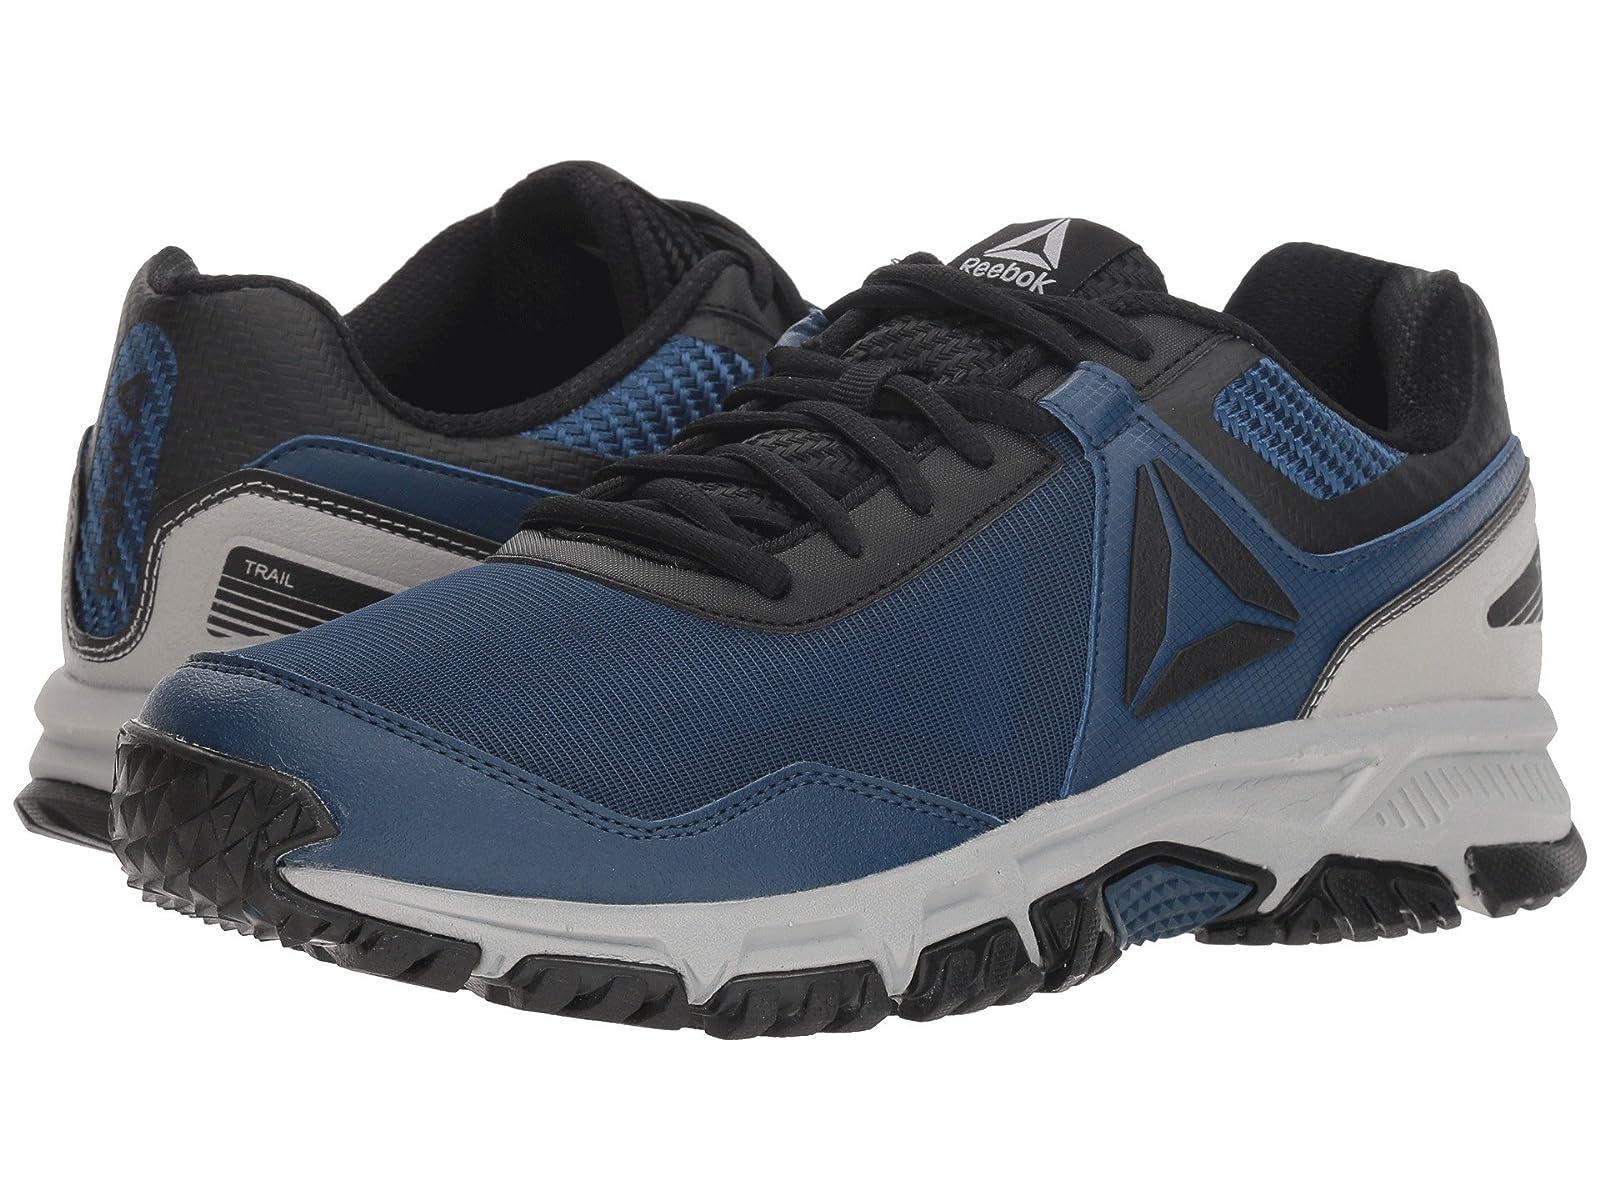 Reebok Ridgerider Trail 3.0Cheap and distinctive eye-catching shoes